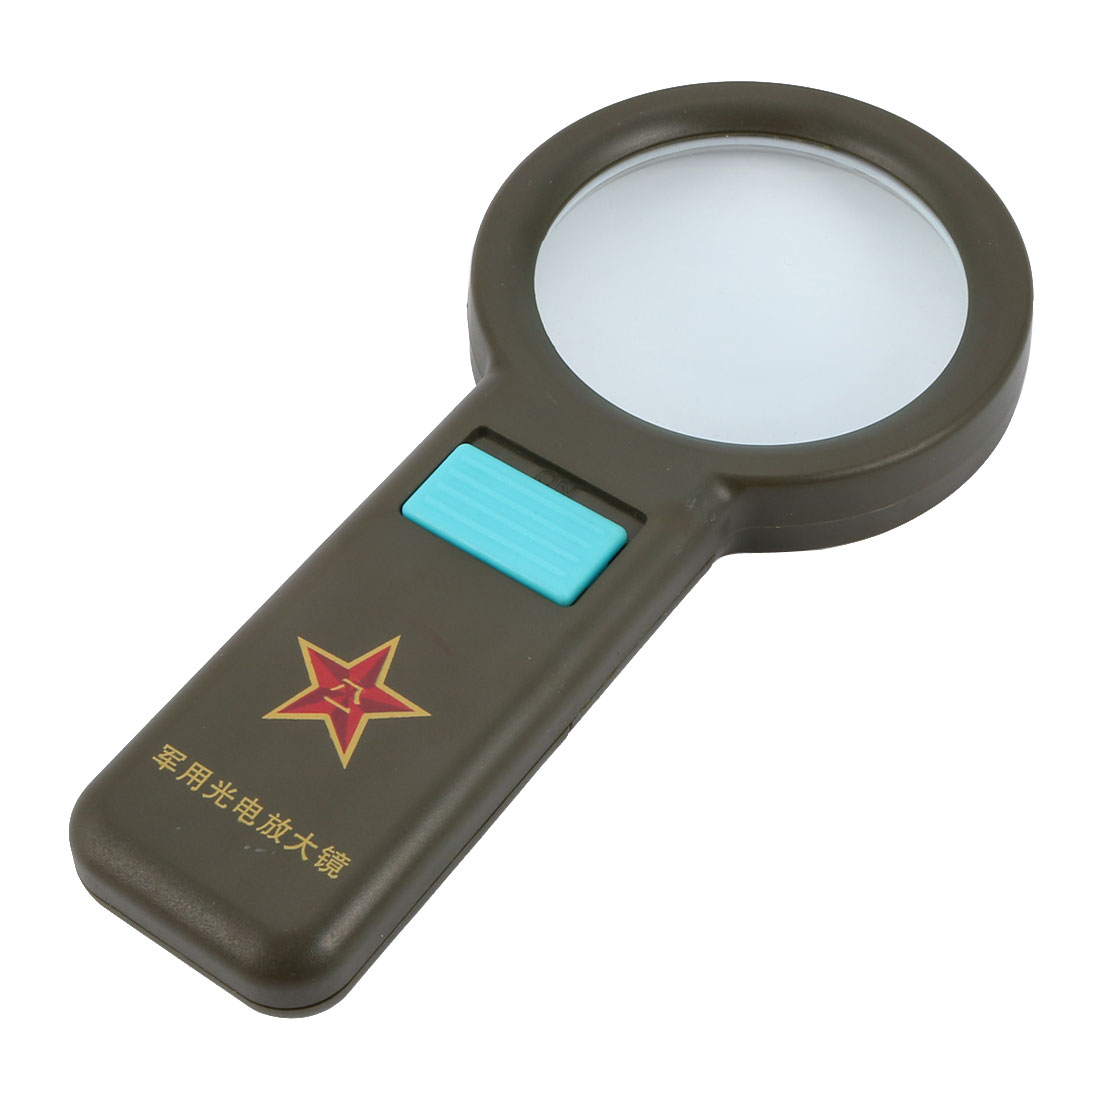 10PCS Portable Small Magnifier Plastic Magnifier Developmental Toy for Kids ca